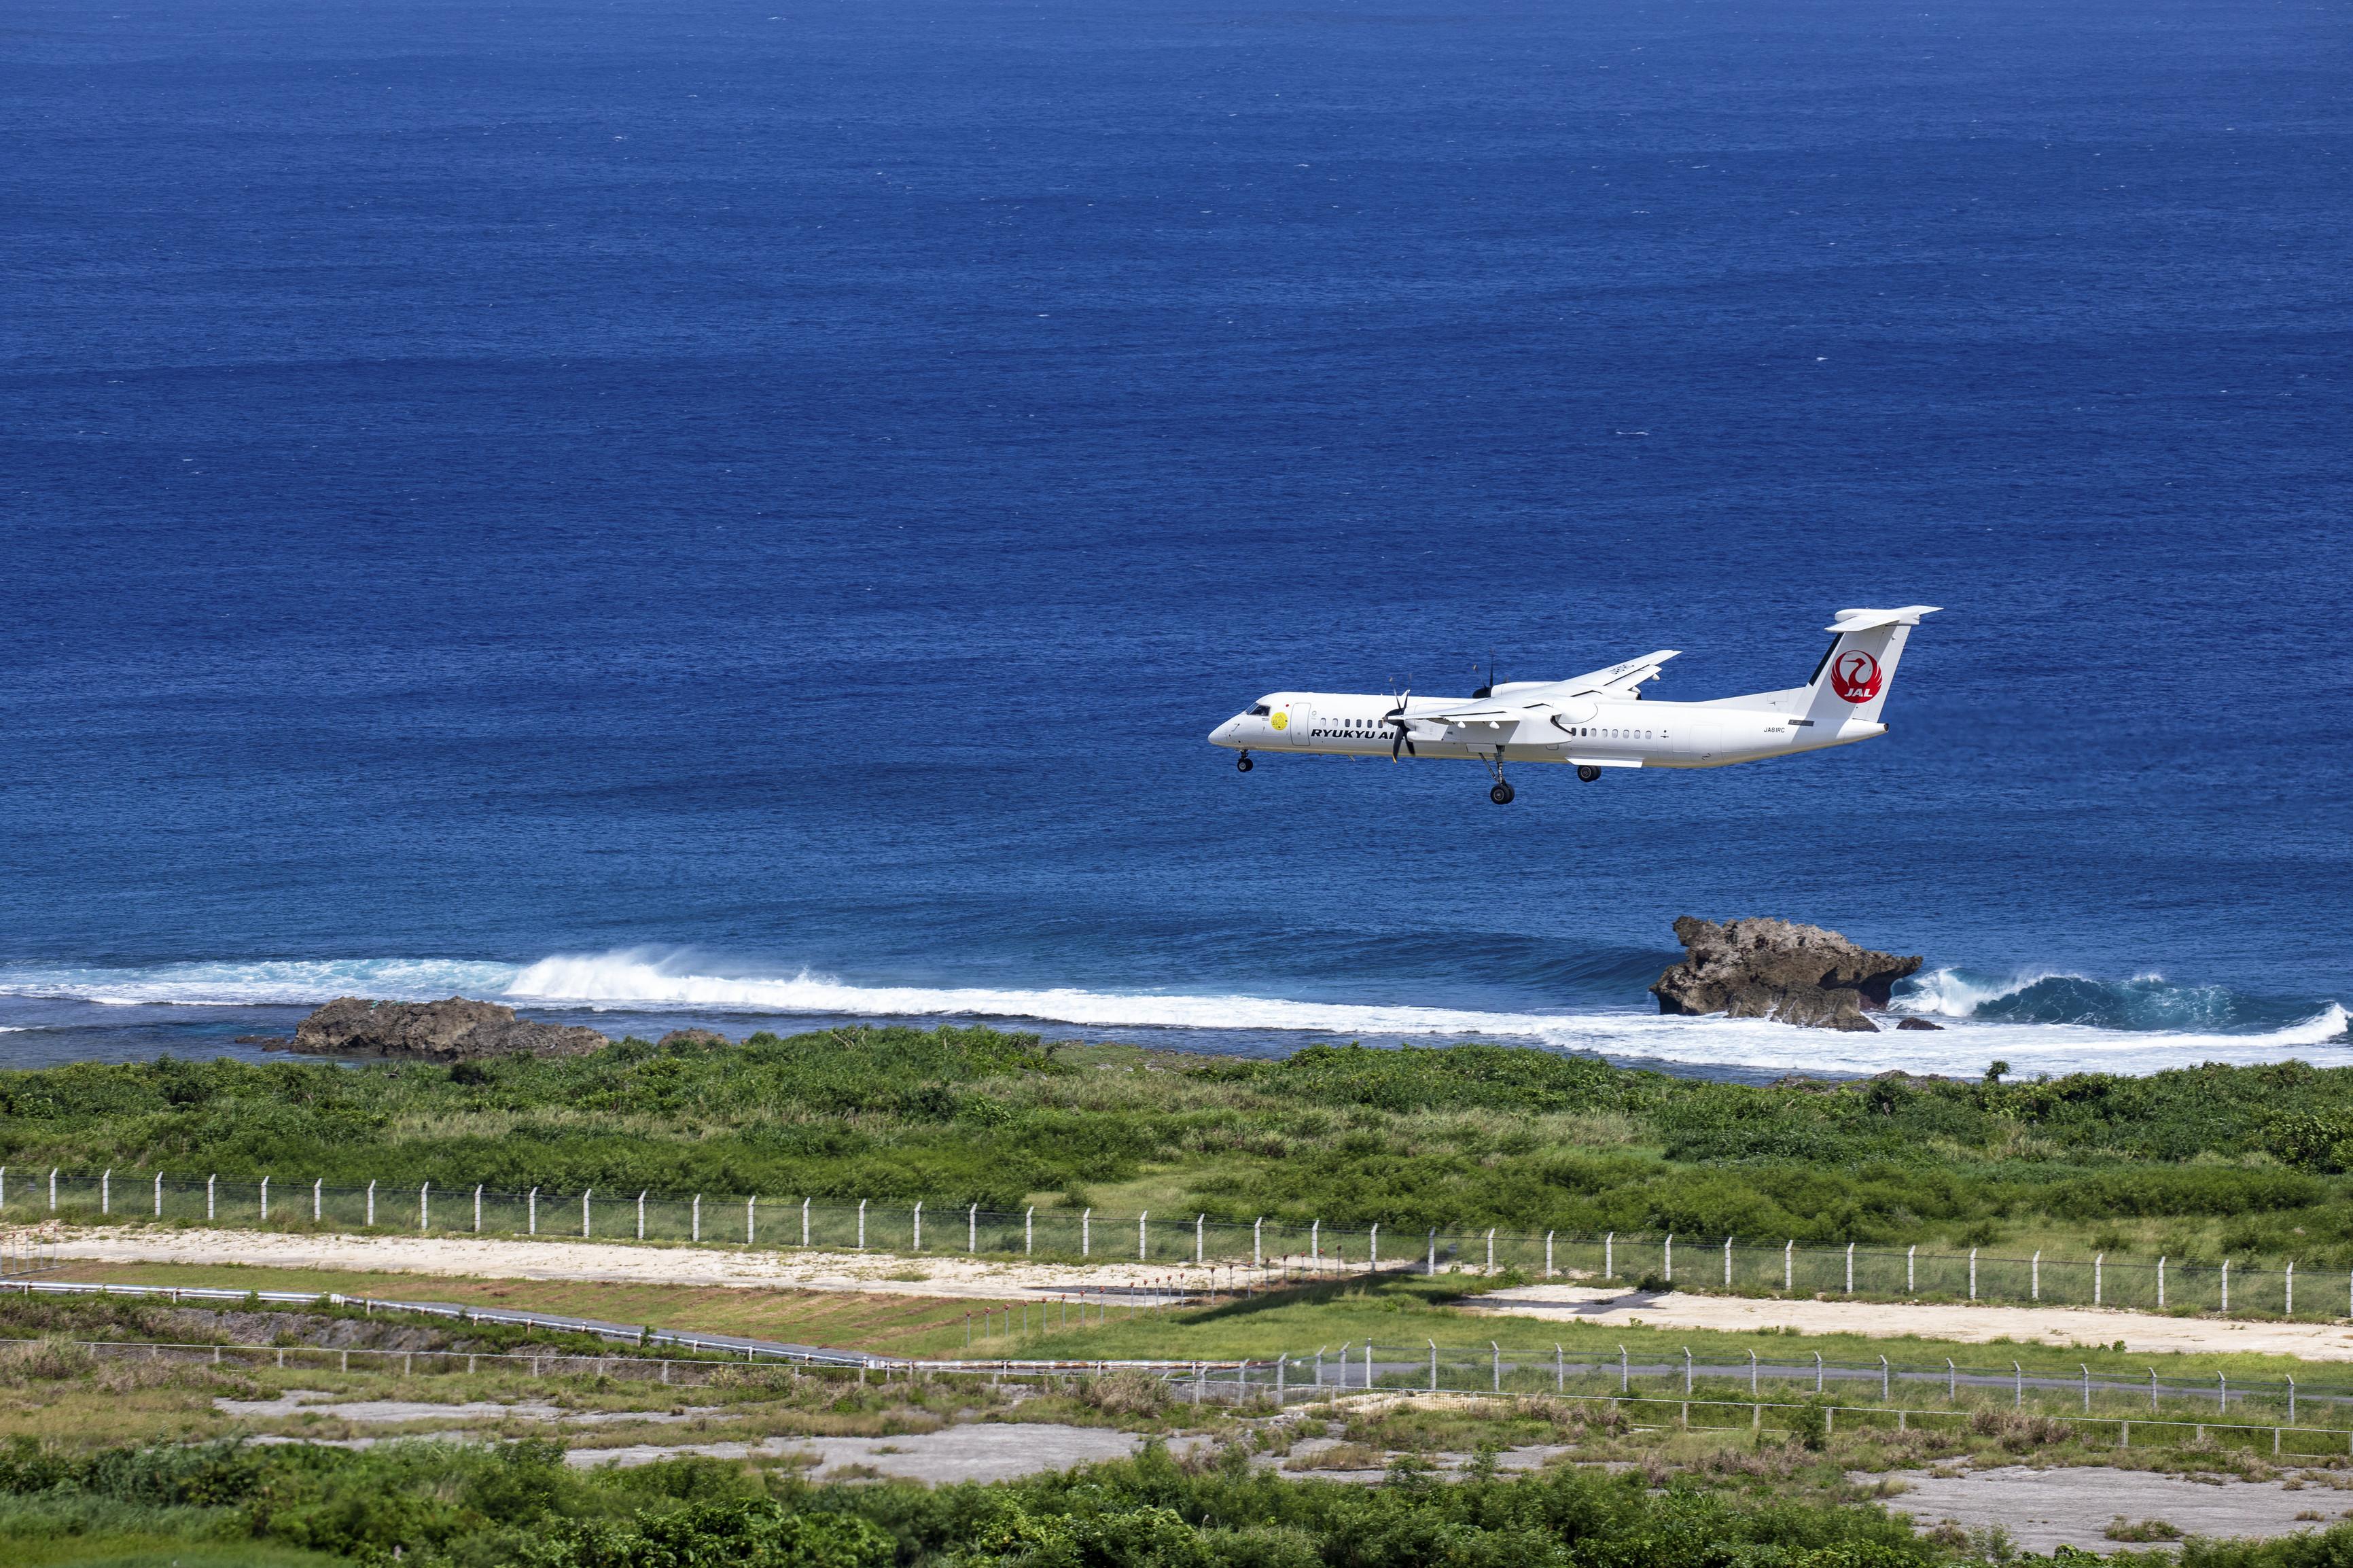 19_Junji+Makino-一番西の美ら海-沖縄+与那国島